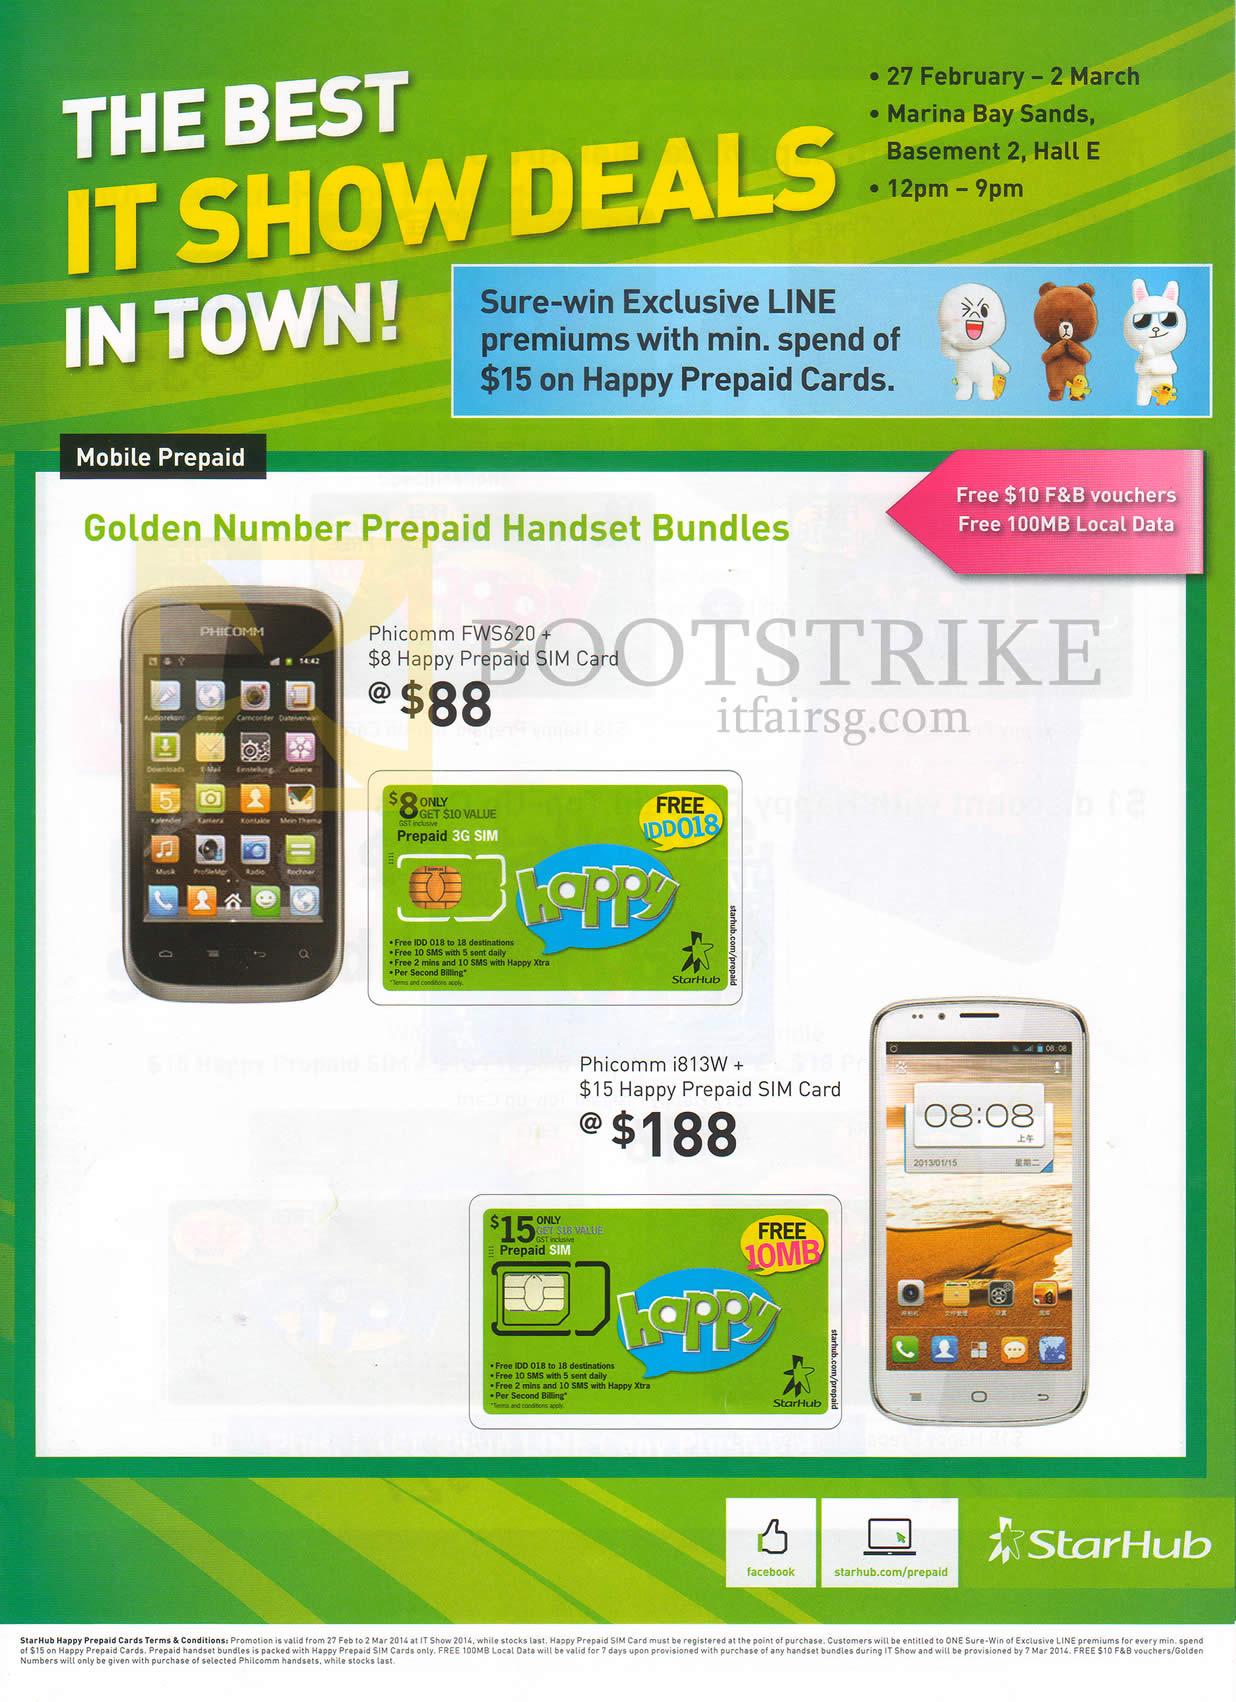 IT SHOW 2014 price list image brochure of Starhub Mobile Prepaid Phicomm FWE620, I813W